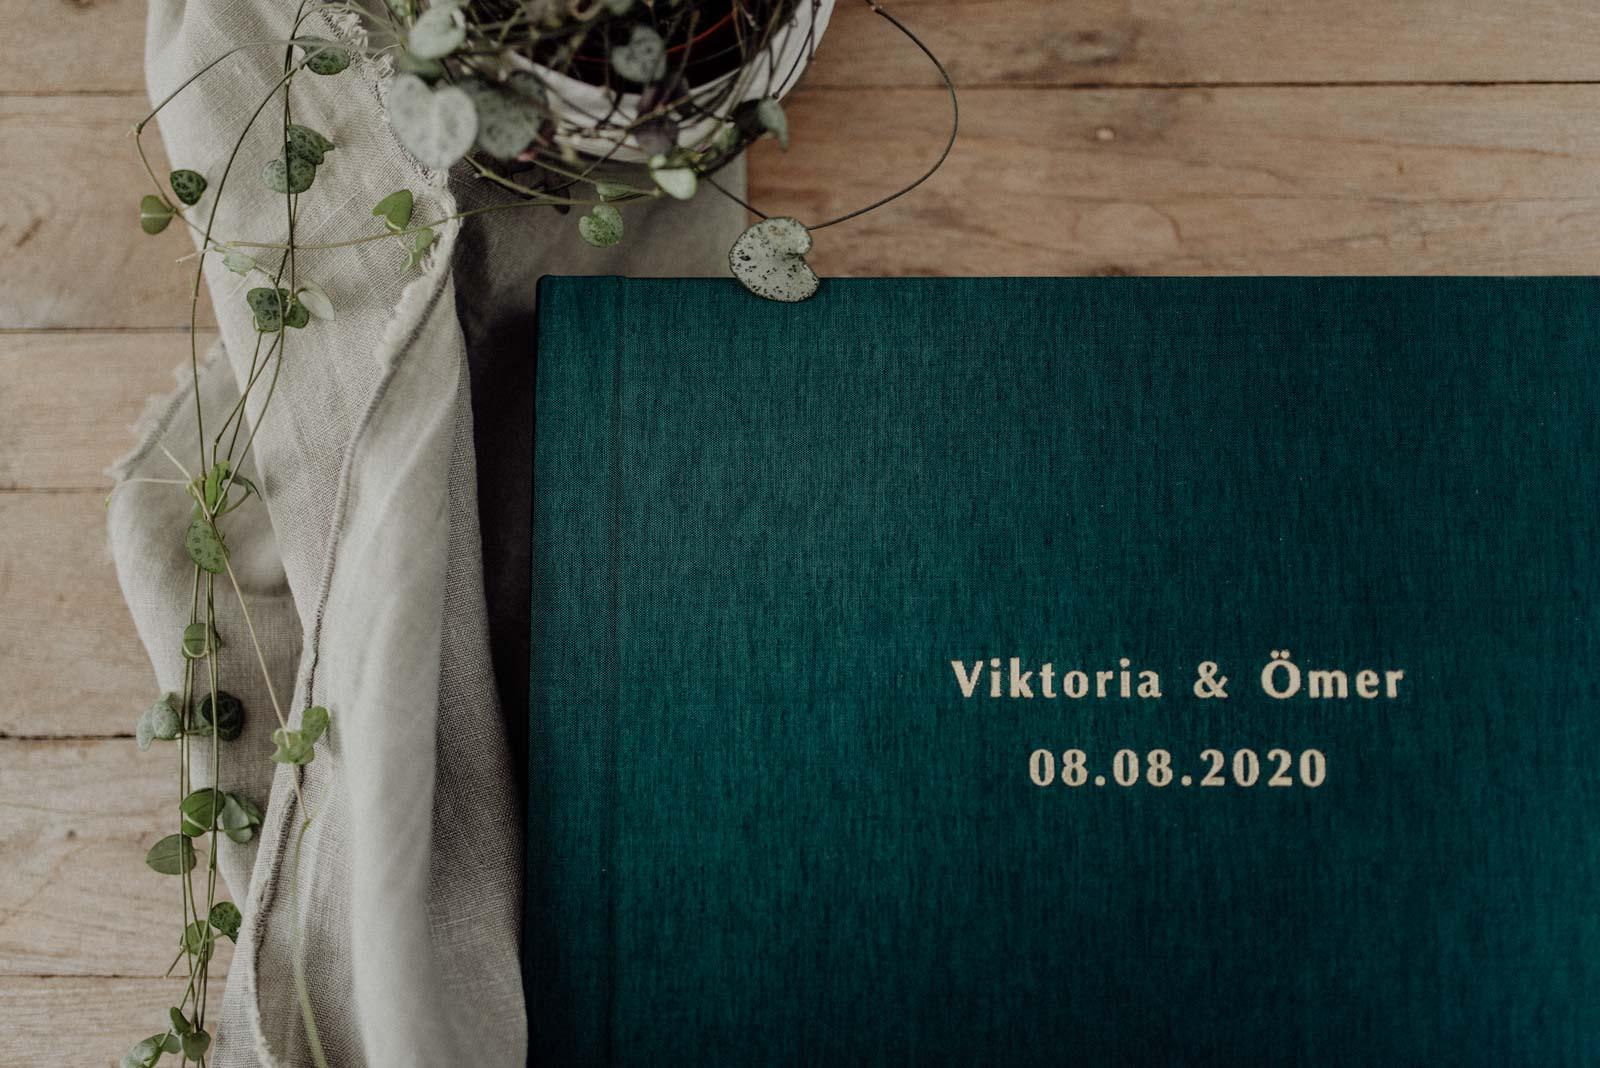 027-Fotoalbum-Fotobuch-Premium-Fotograf-Witten-Luxus